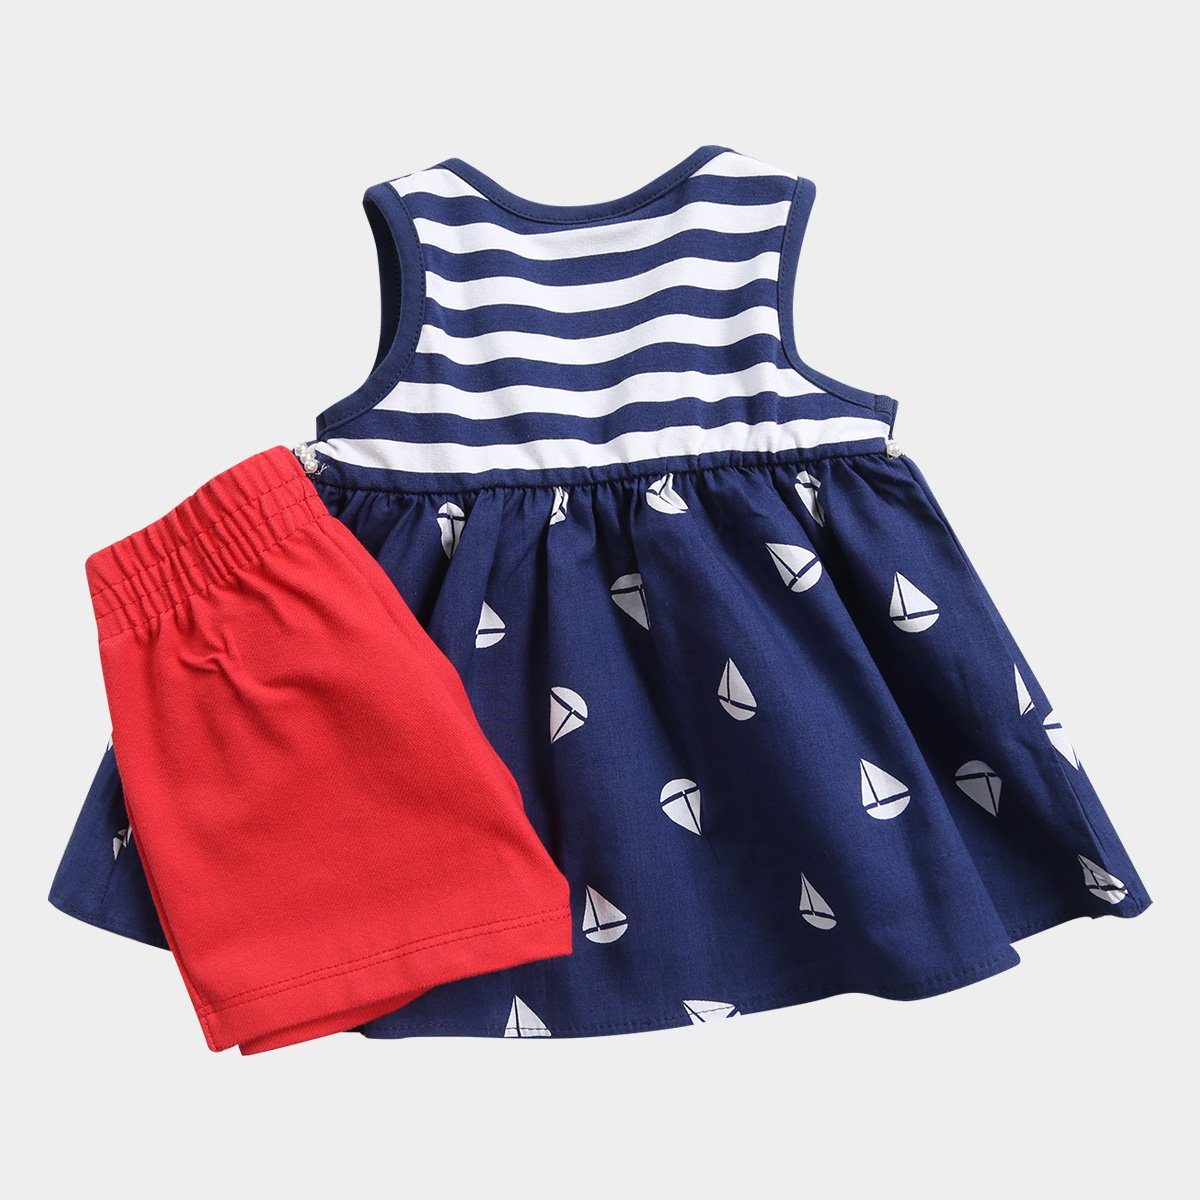 Listrada Navy Feminino Barquinhos Milon Azul Conjunto Infantil Conjunto Infantil UcqXP